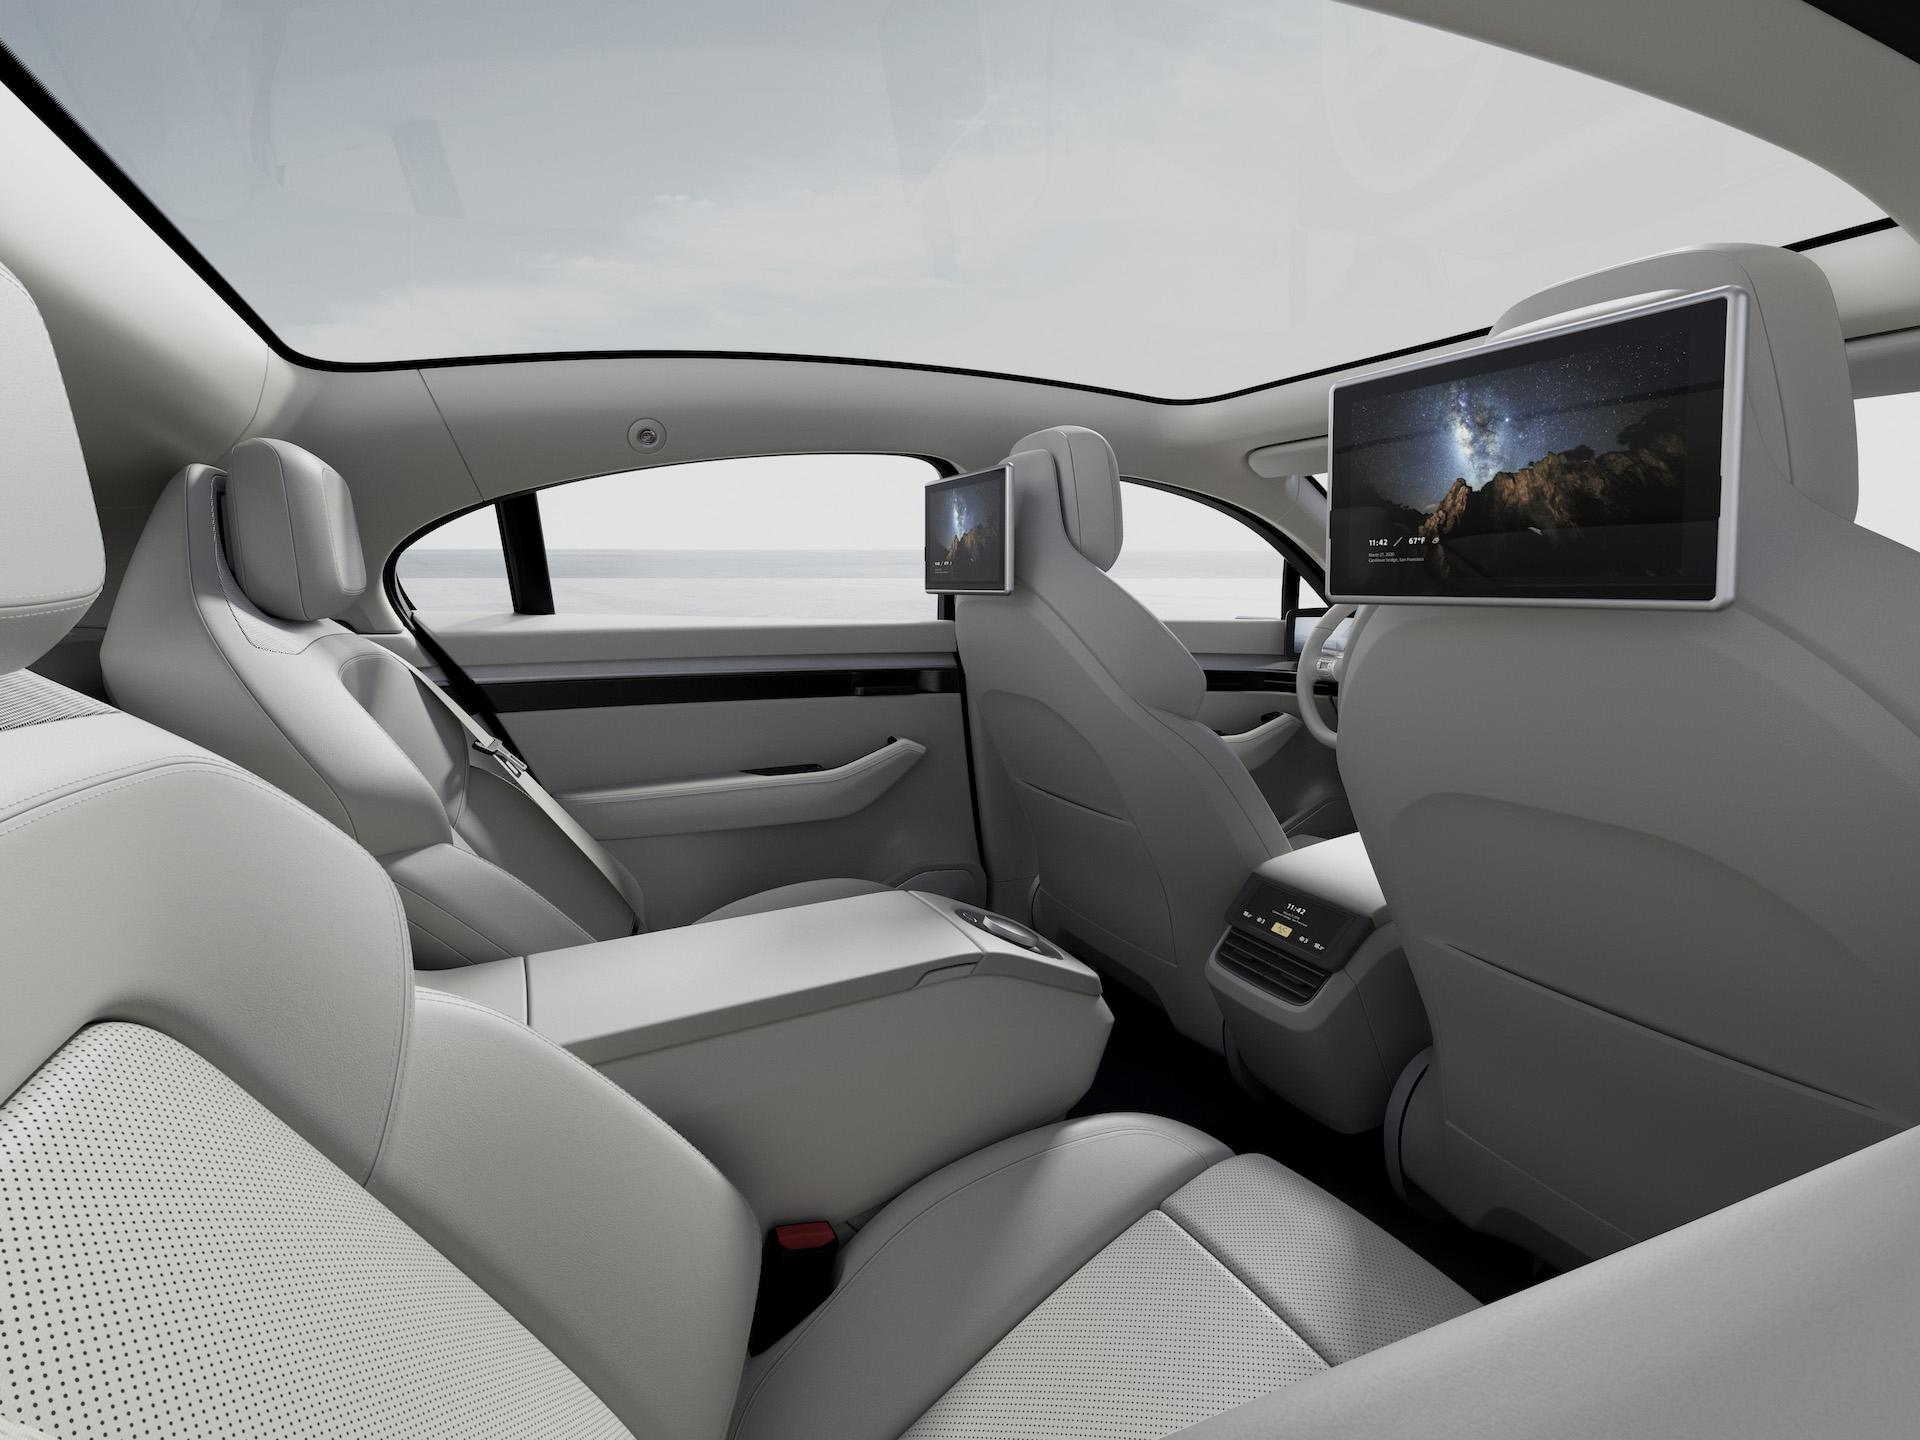 Vision S: Sony präsentiert den Prototypen eines eigenen Elektroautos 2